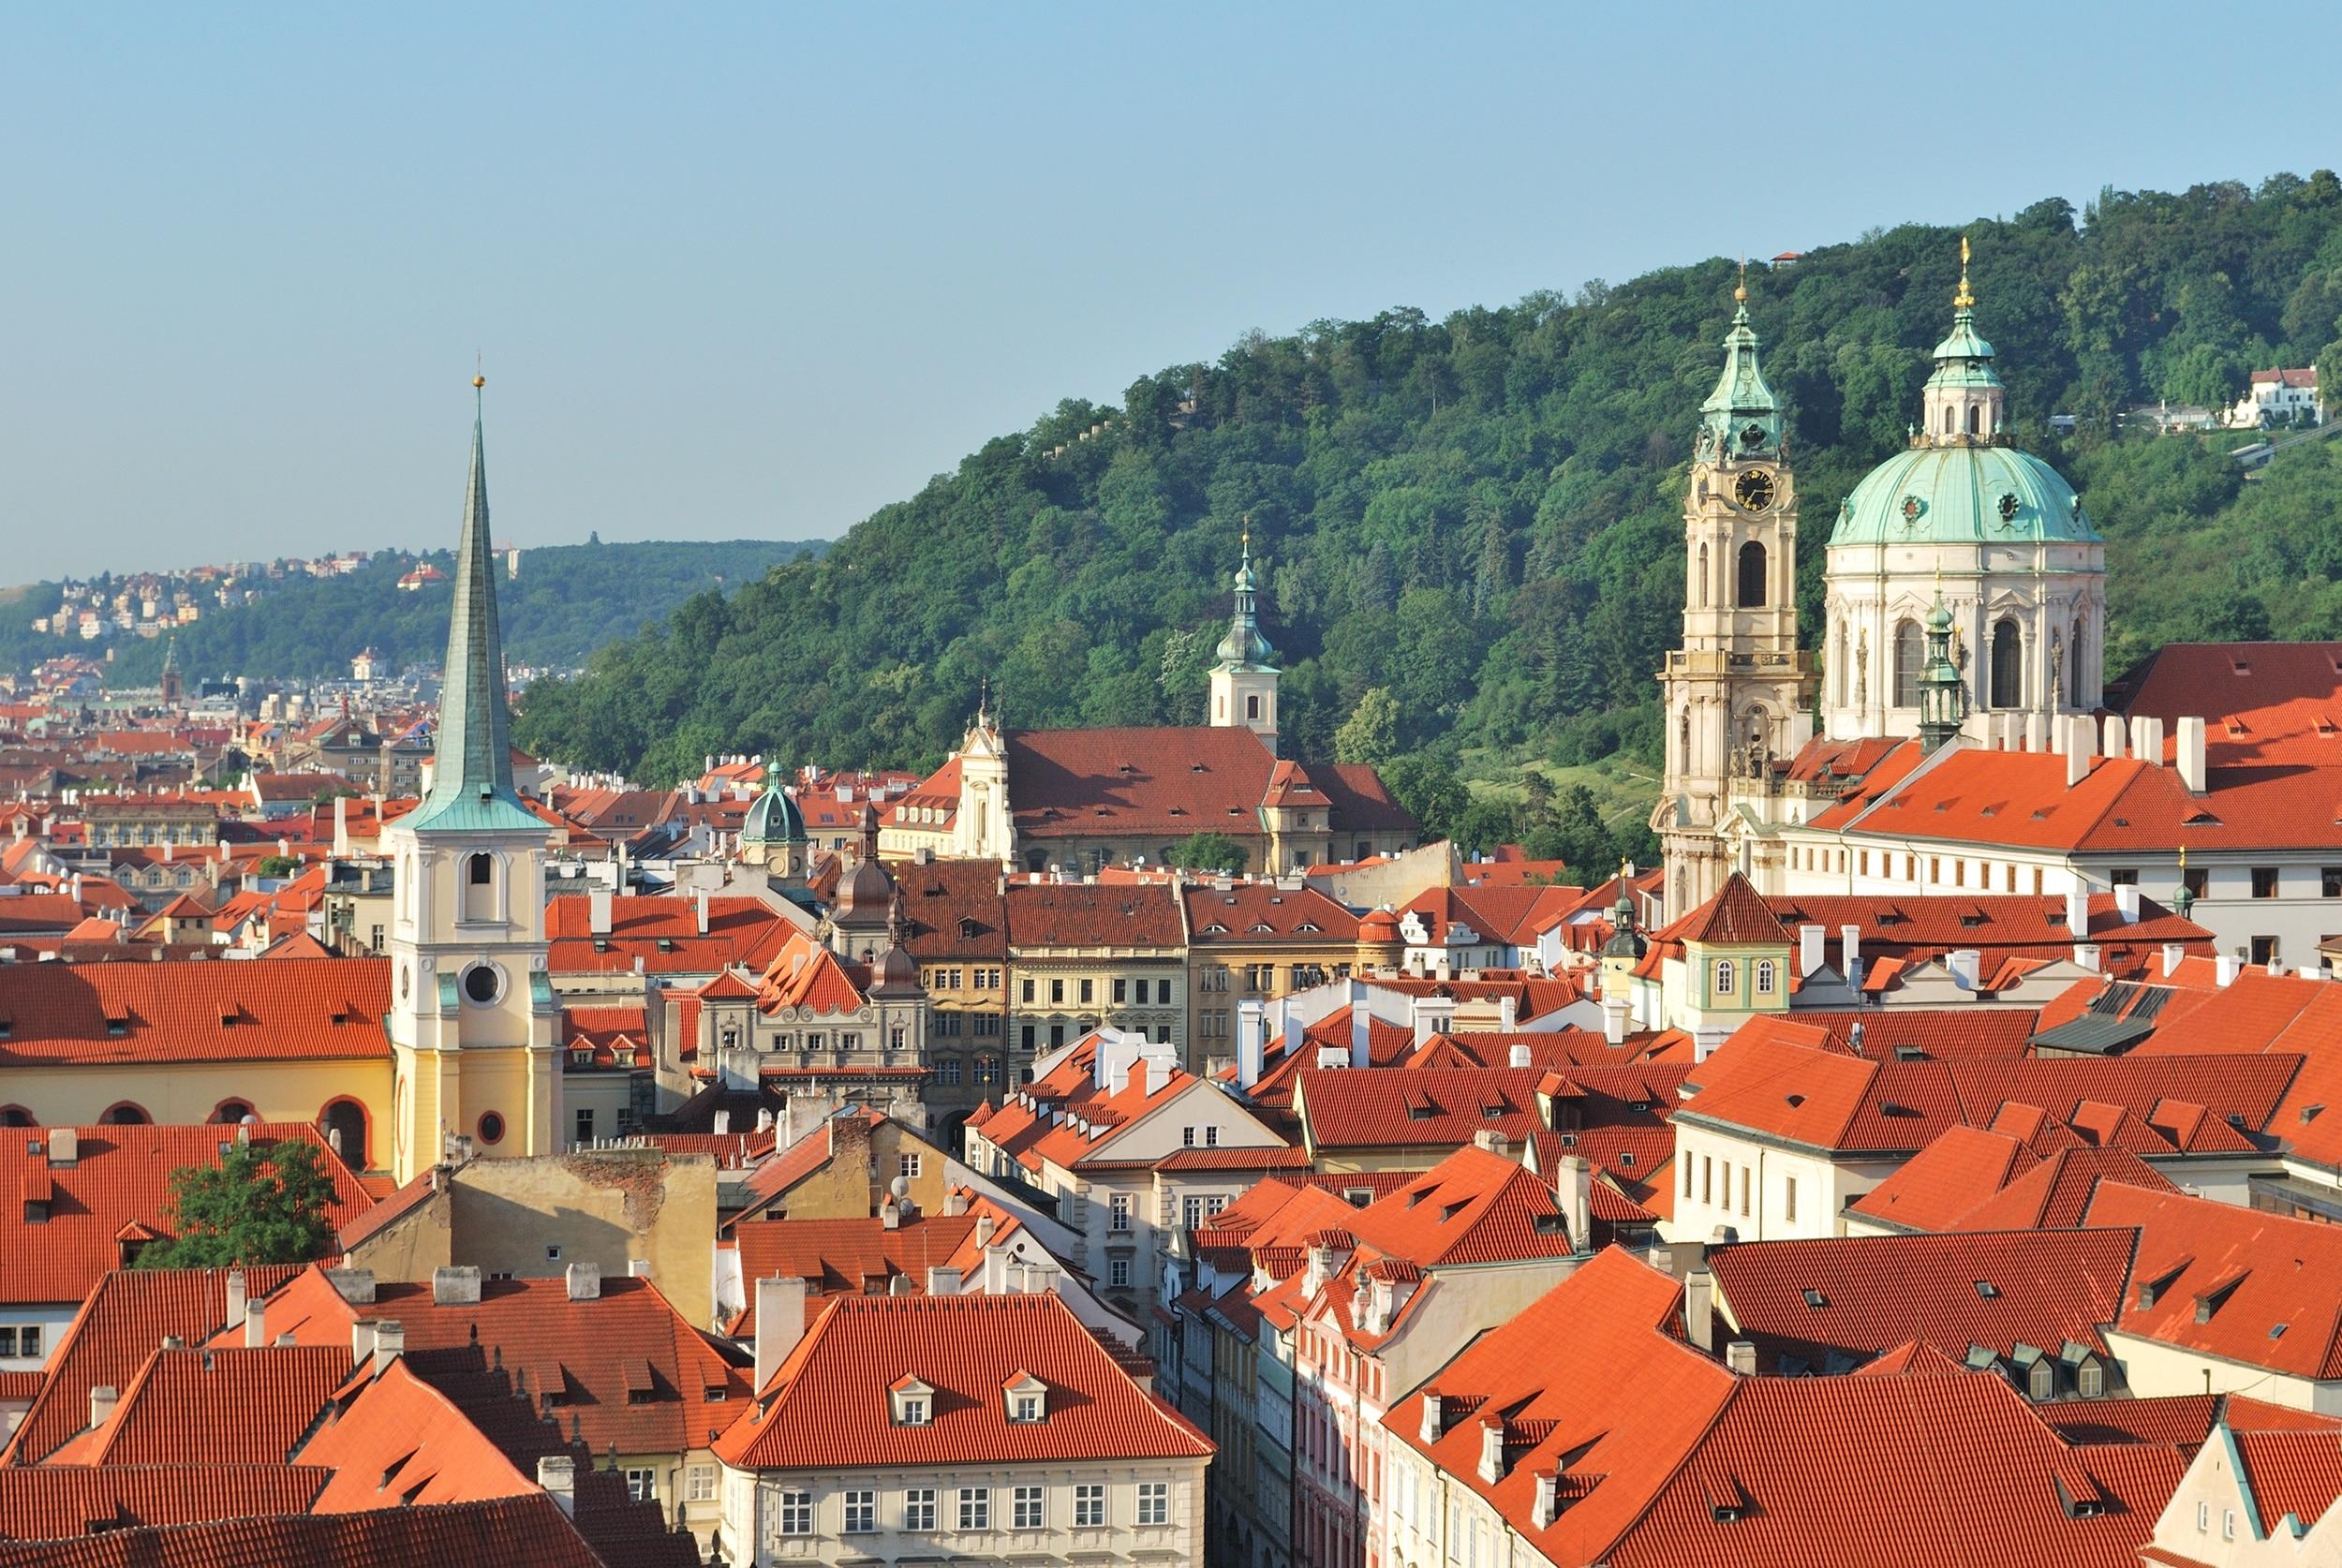 Benesov, Central Bohemia Region, Czech Republic